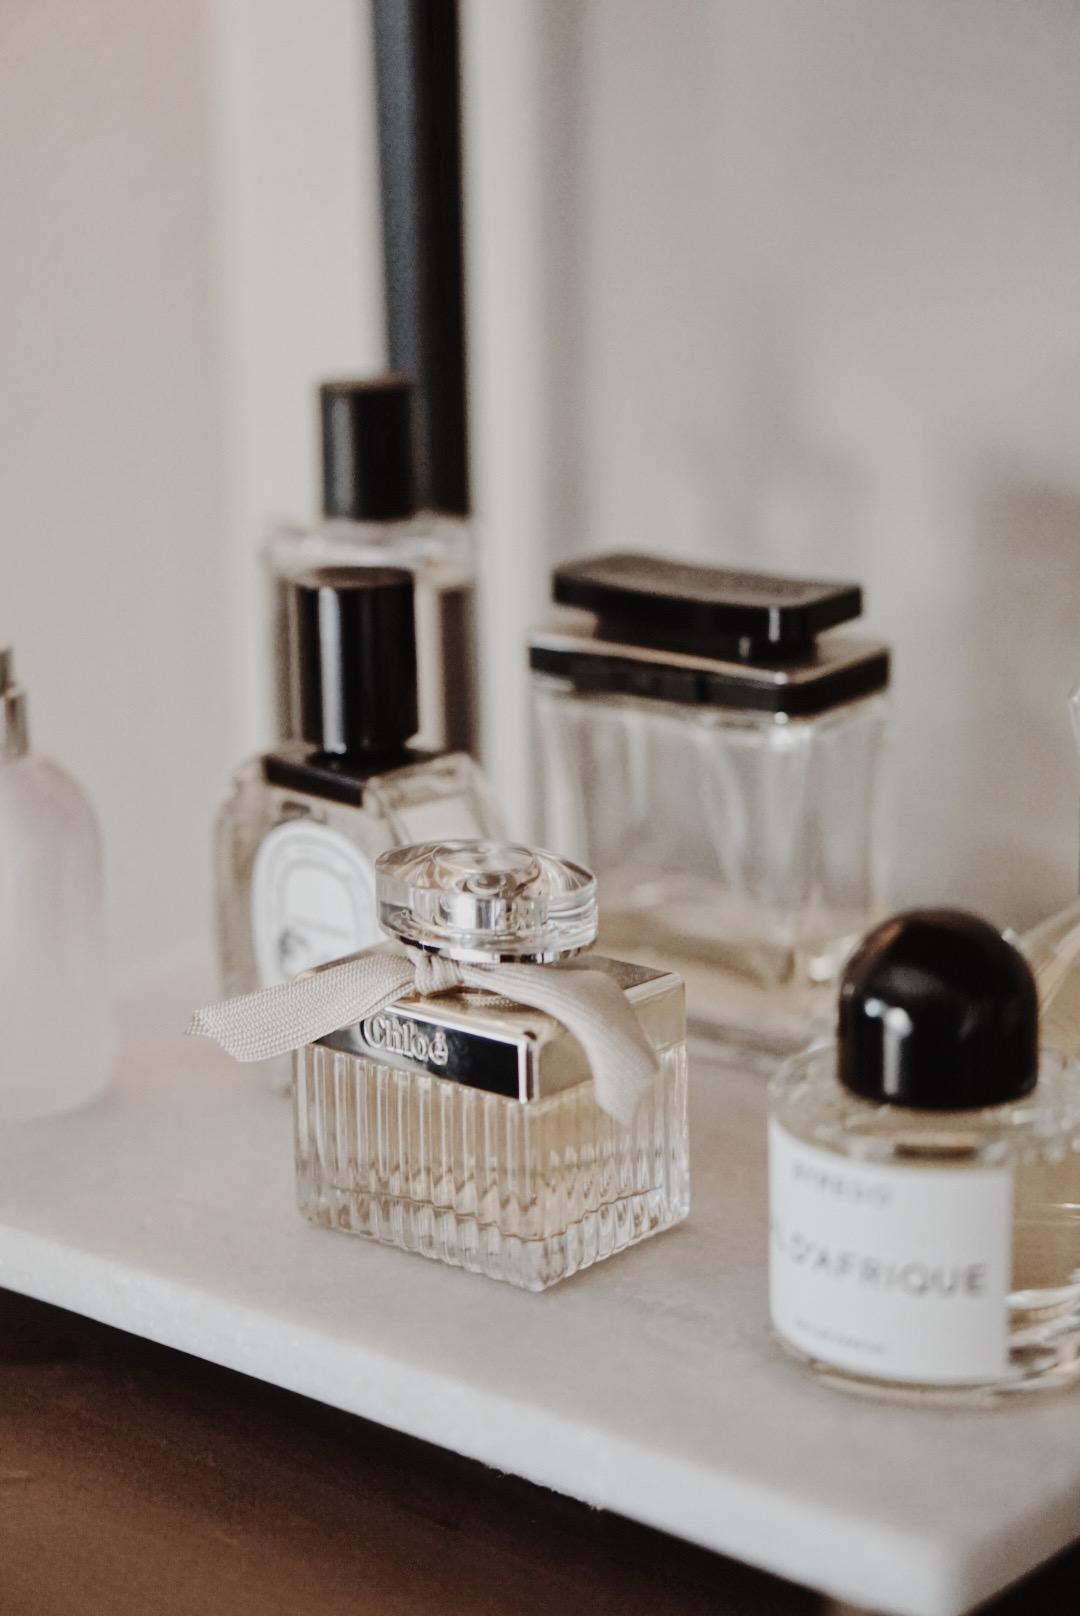 Fragrance Wardrobe - Chloe EDP, Marc by Marc Jacobs, Byredo Bal d'Afrique